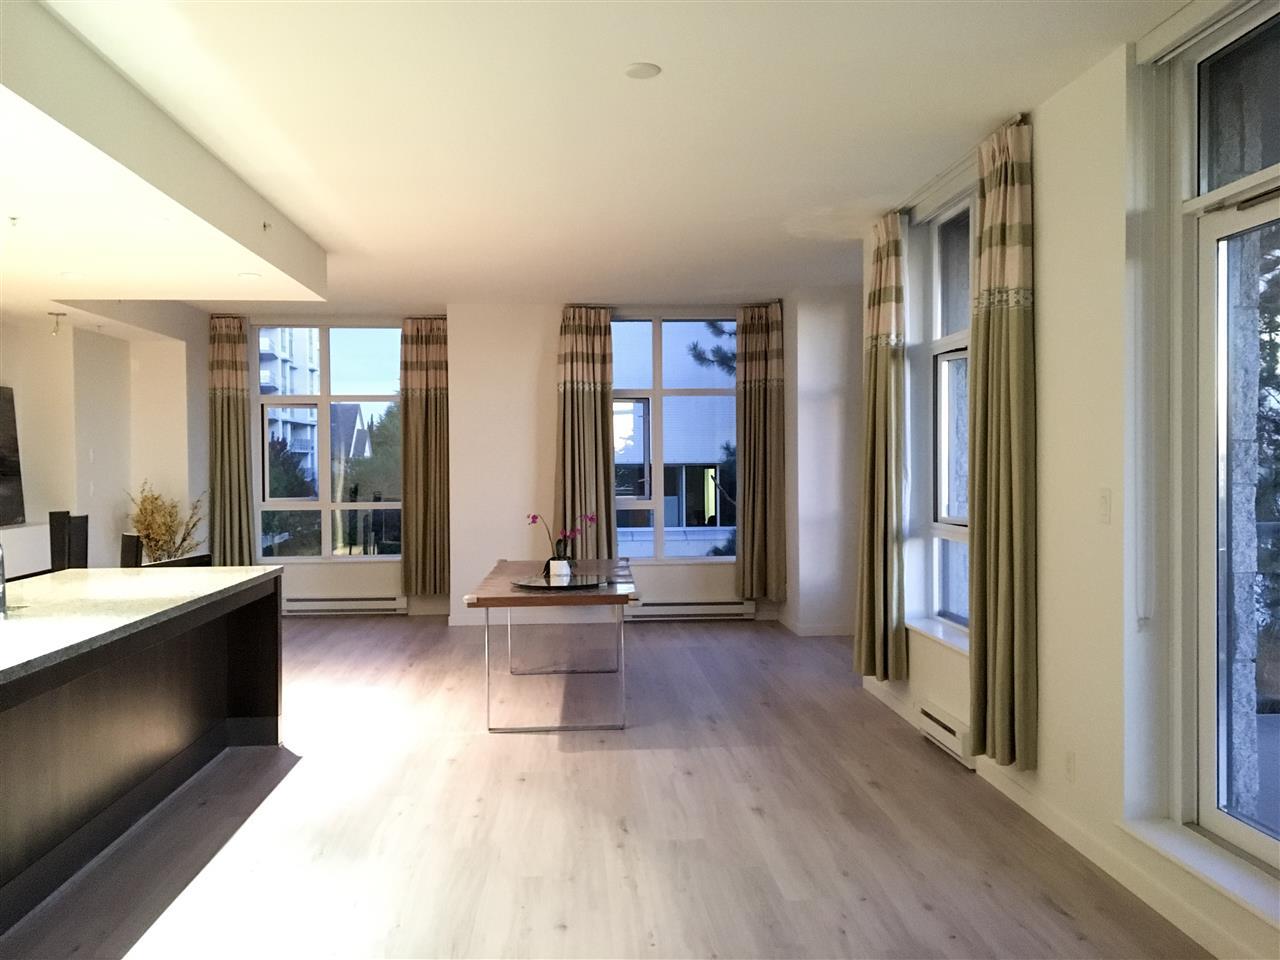 Condo Apartment at 303 6093 IONA DRIVE, Unit 303, Vancouver West, British Columbia. Image 6